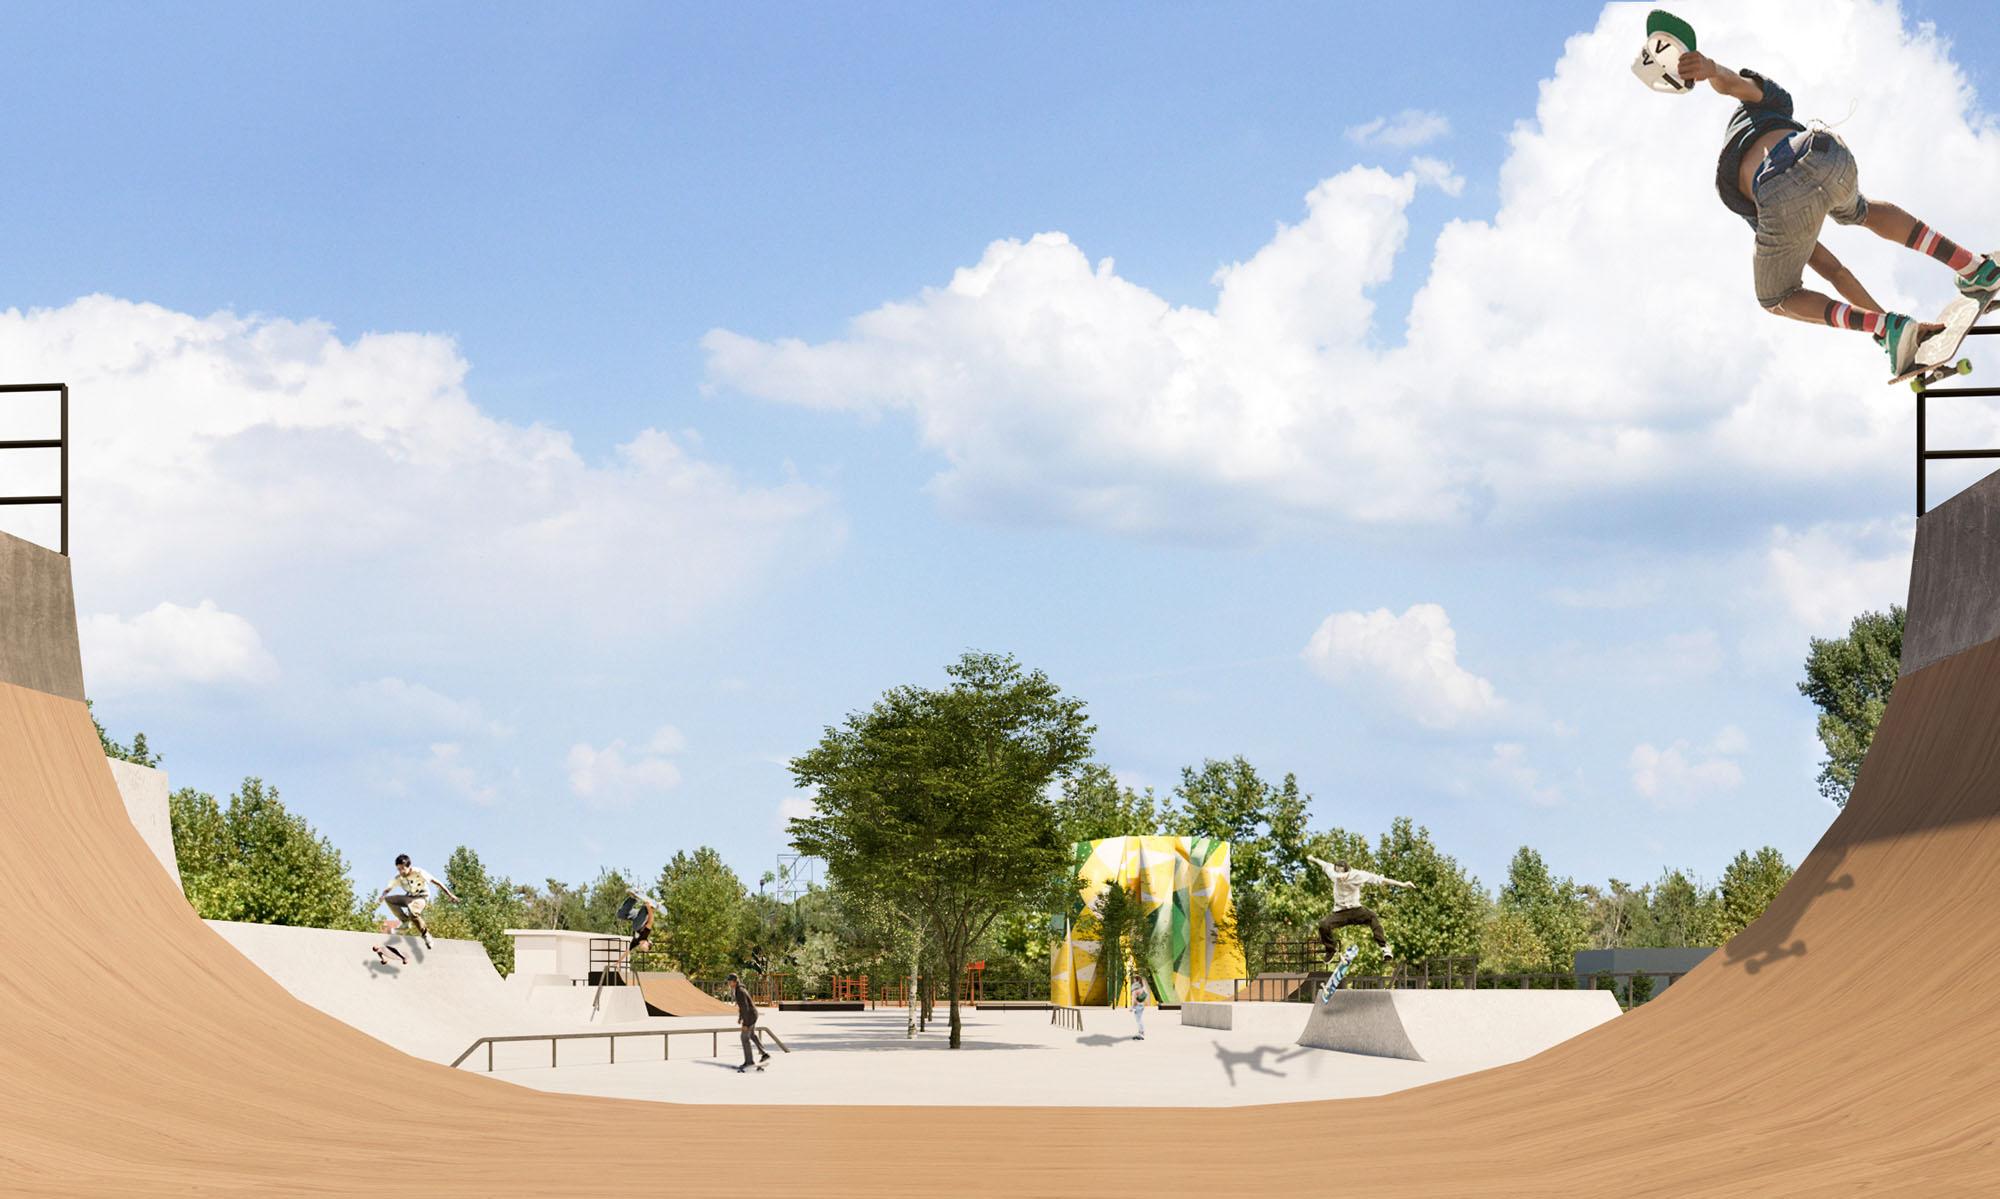 122_Skatepark_016BB